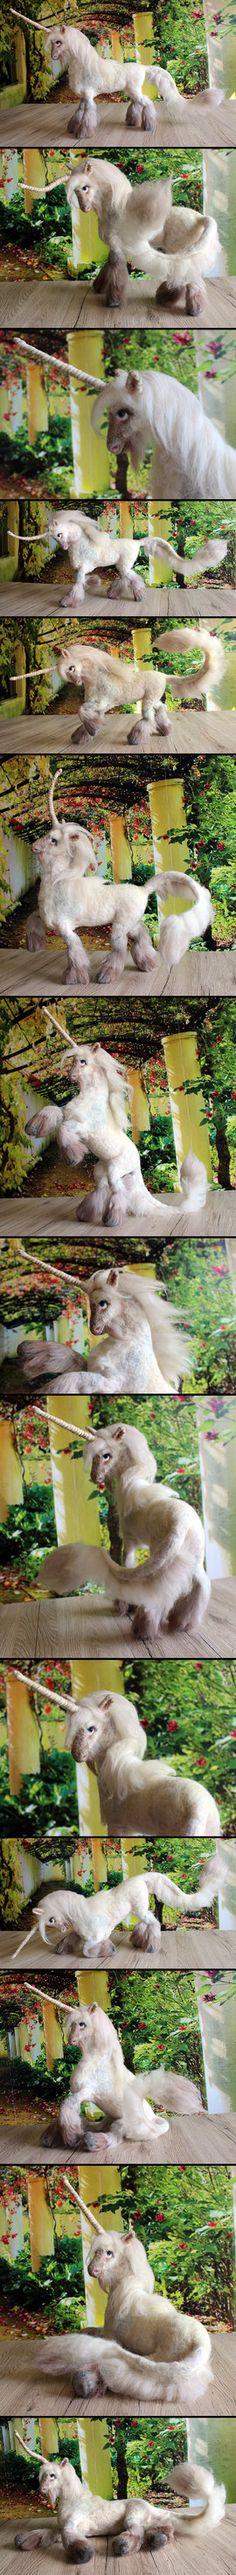 Pearl white Unicorn by Finya-Vardeen.deviantart.com on @DeviantArt